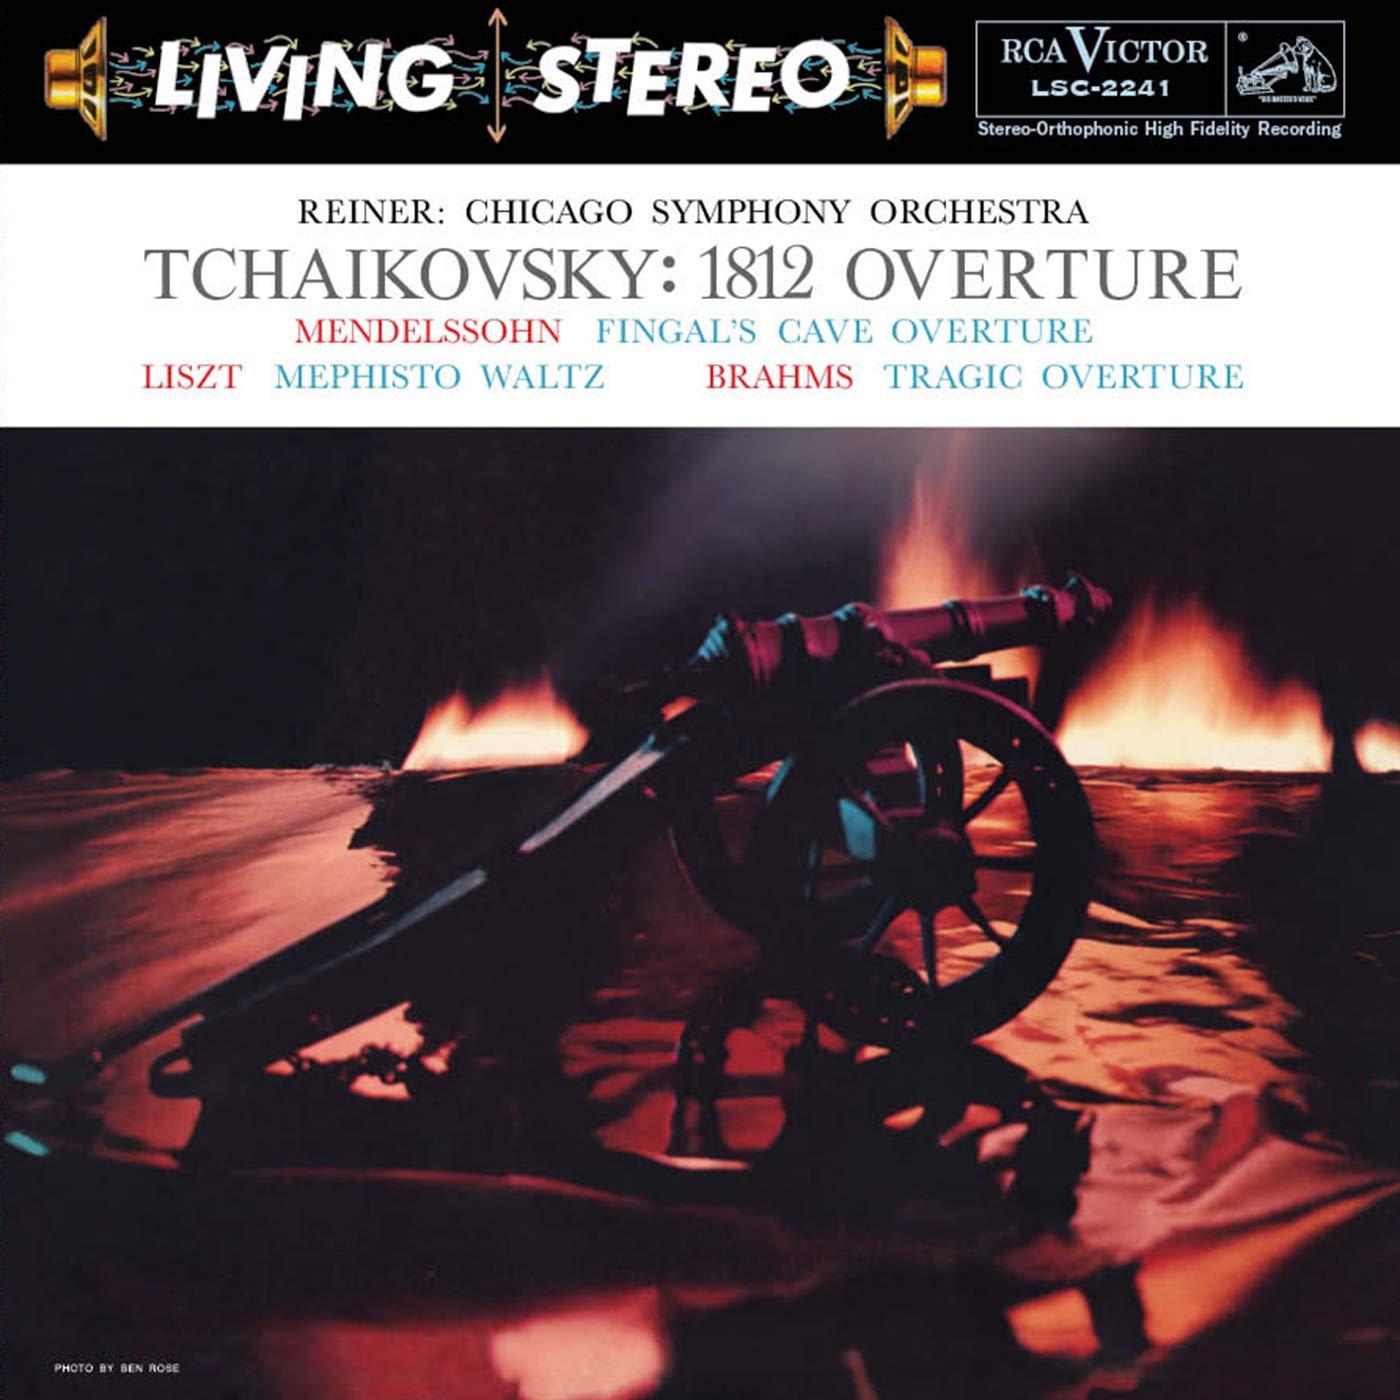 Vinilo : Fritz Reiner - Tchaikovsky: 1812 Overture (200 Gram Vinyl)